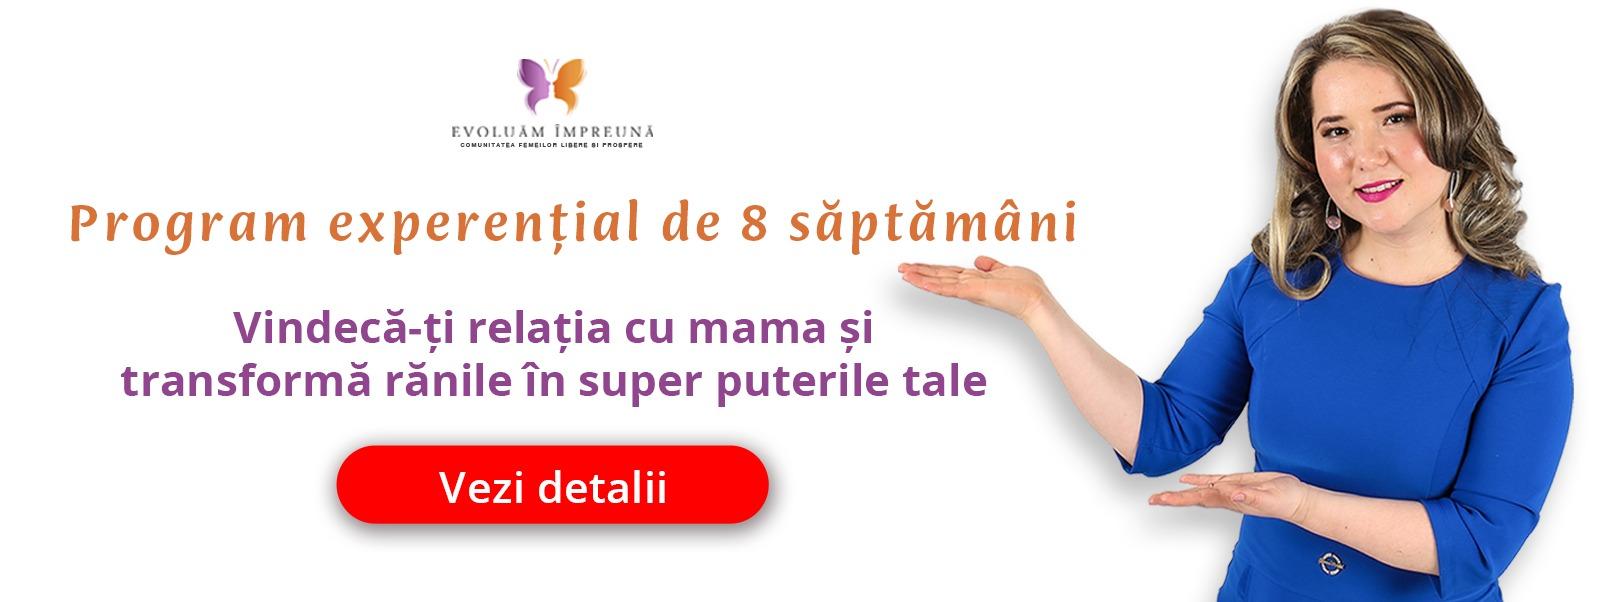 banner relatia cu mama